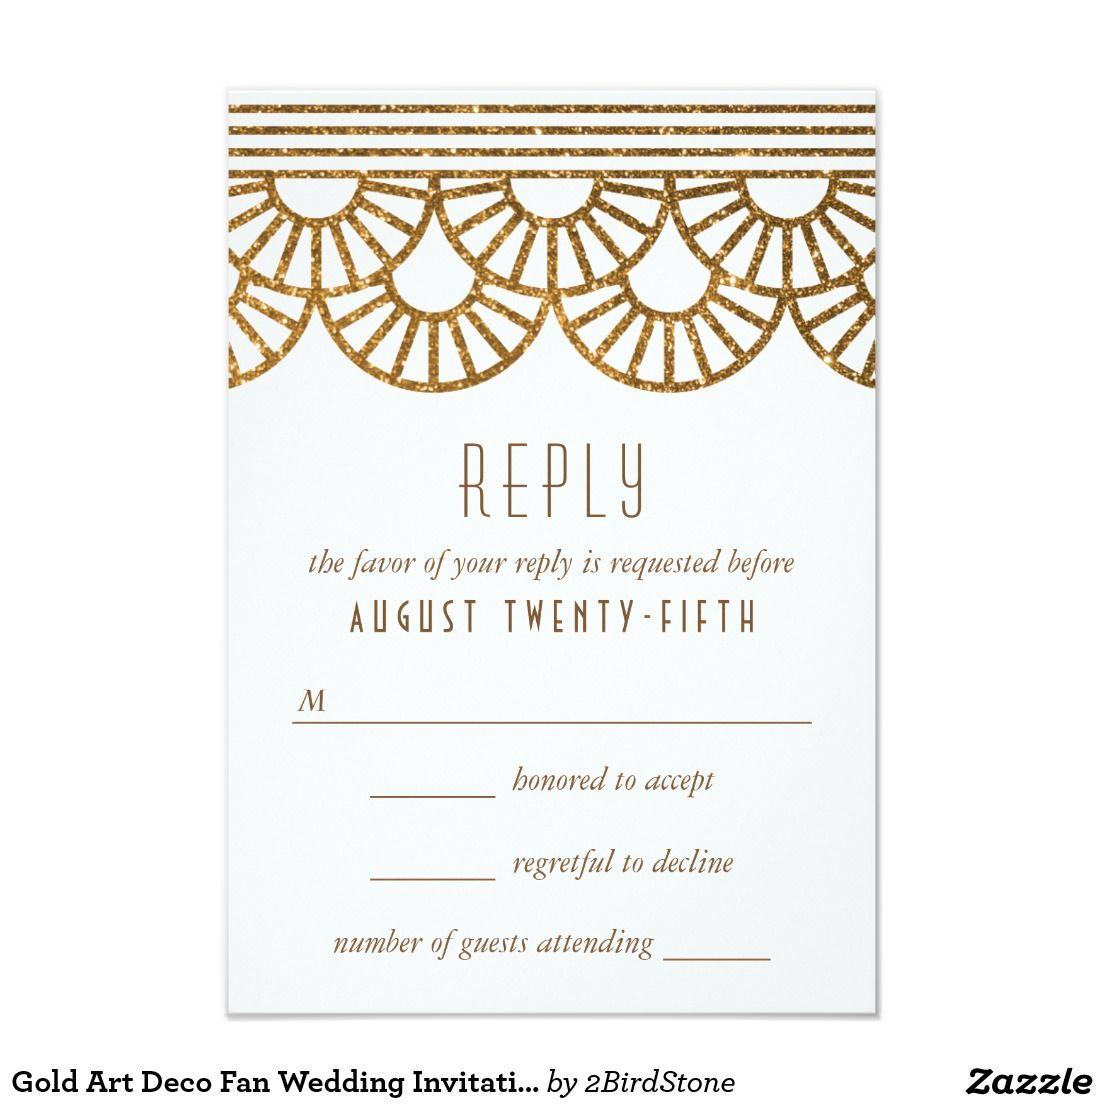 Gold Art Deco Fan Wedding Invitation Reply Card | Gold art, Art deco ...